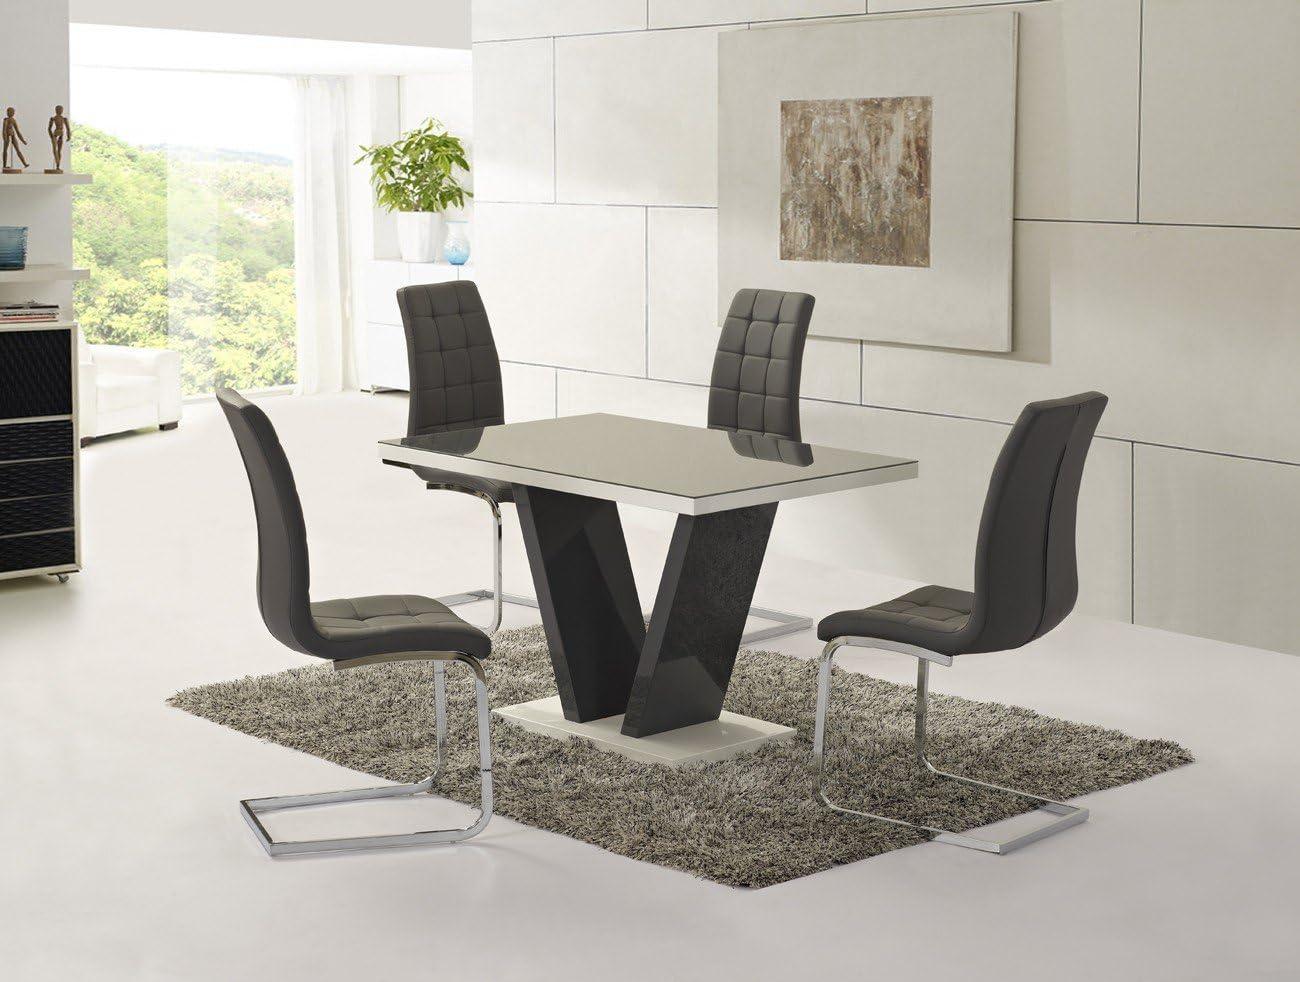 Comedor gris con alto acabado brillante Zara + 4 sillas para ...